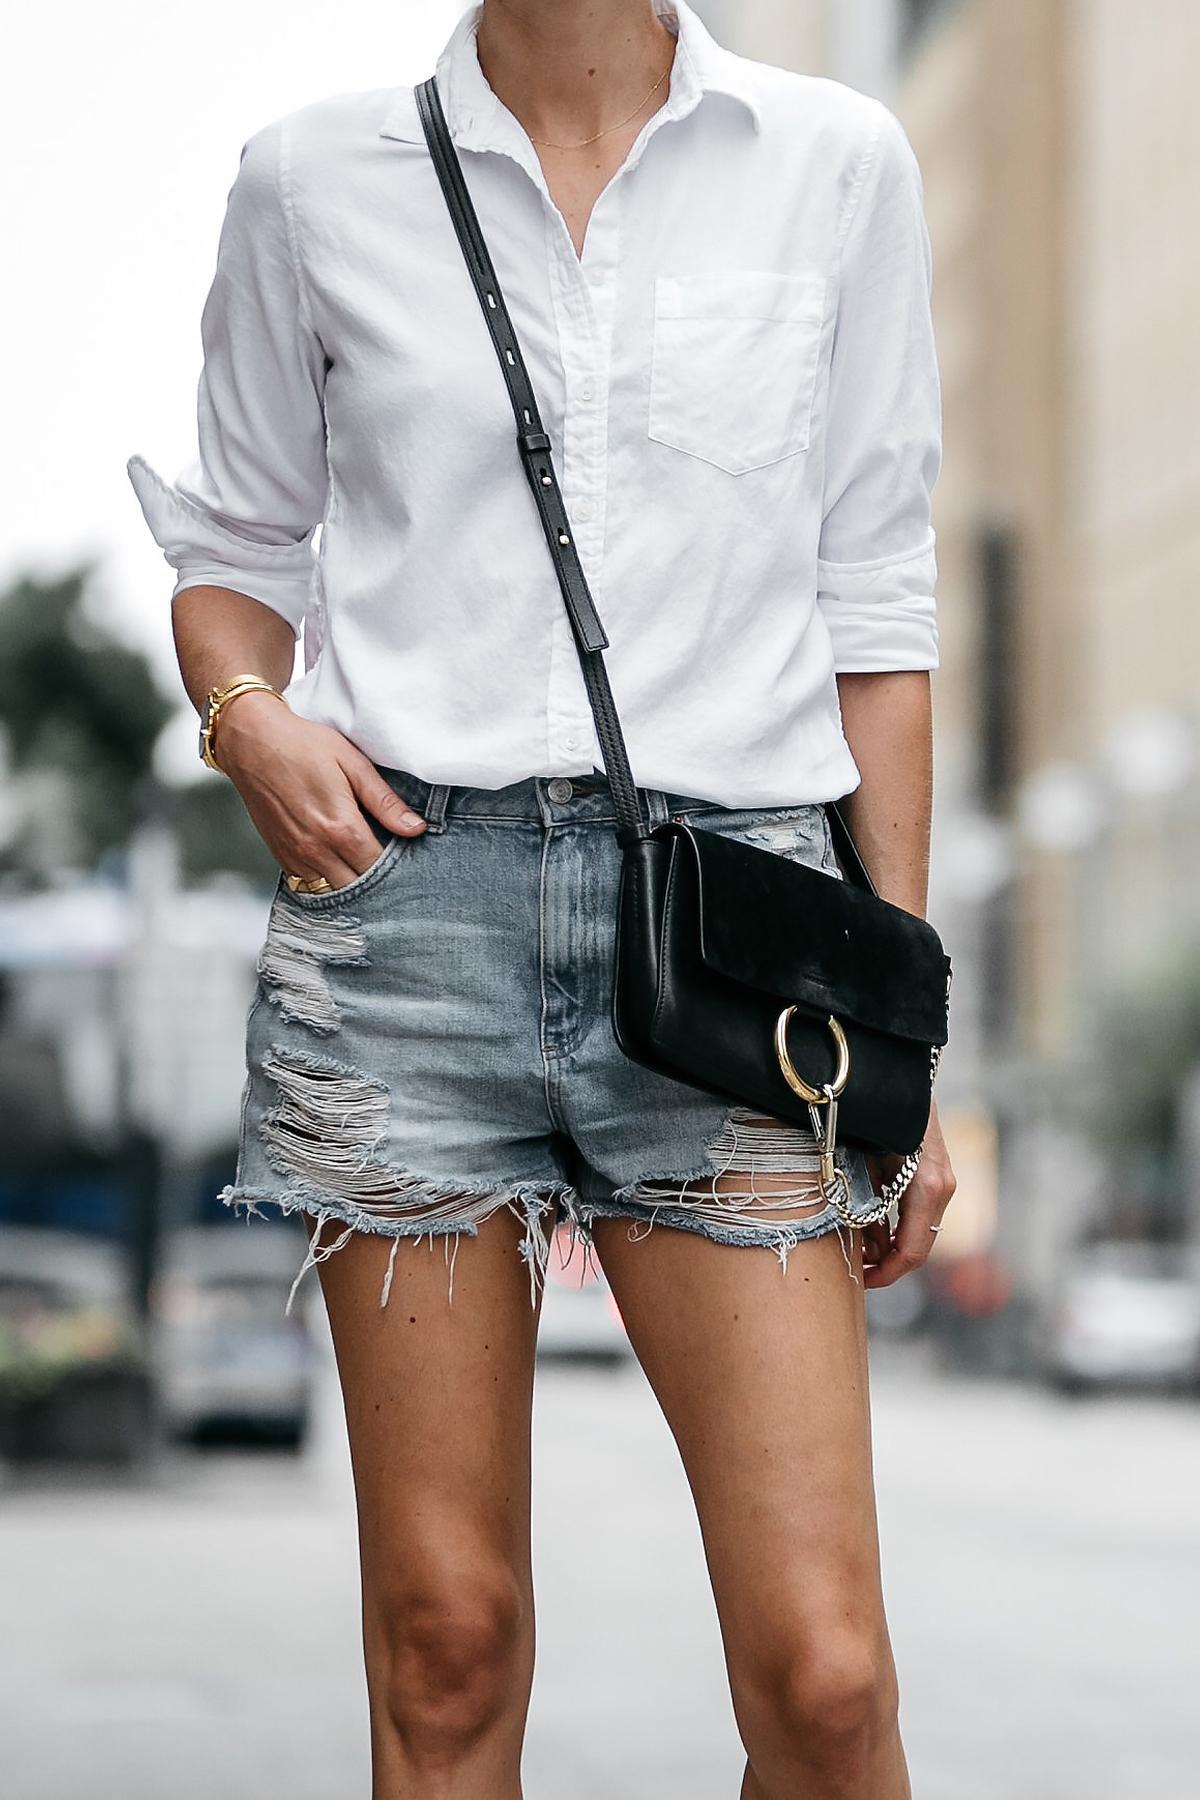 Banana Republic White Button Down Shirt Topshop Ripped Denim Cutoff Shorts Outfit Chloe Faye Handbag Street Style Dallas Blogger Fashion Blogger Fashion Jackson